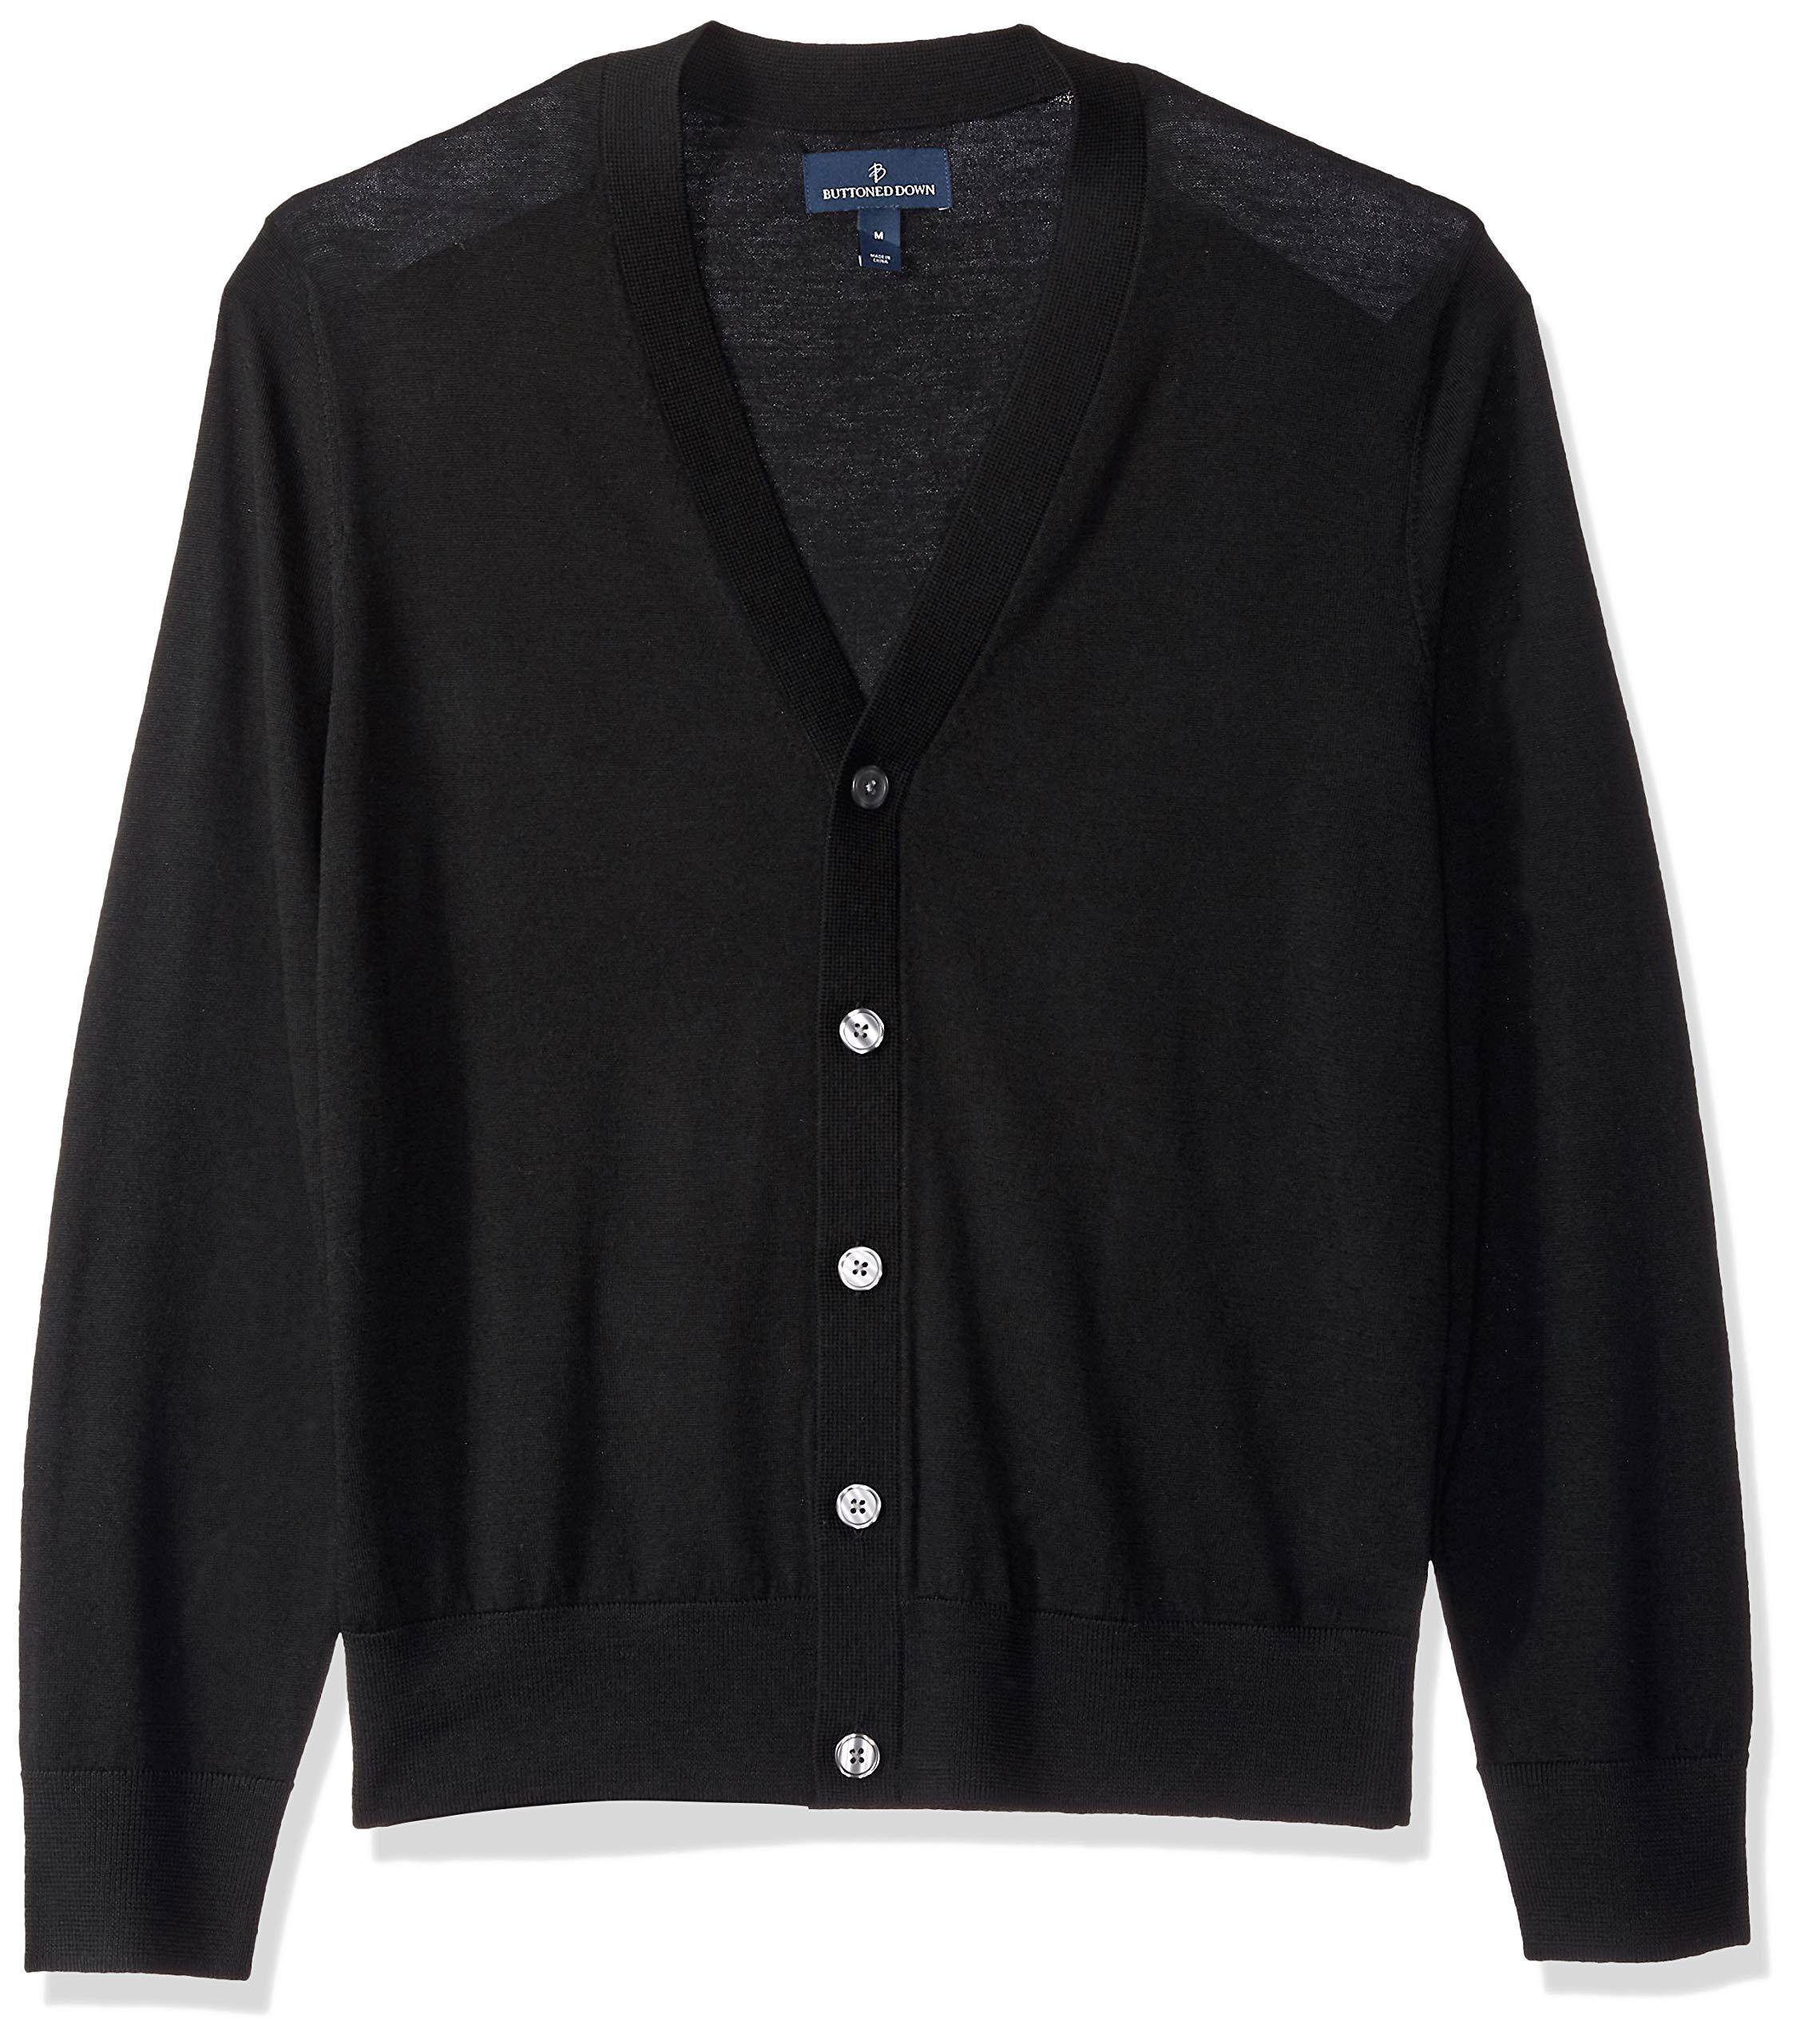 BUTTONED DOWN Men's Italian Merino Wool Lightweight Cashwool Cardigan Sweater, Black, Large